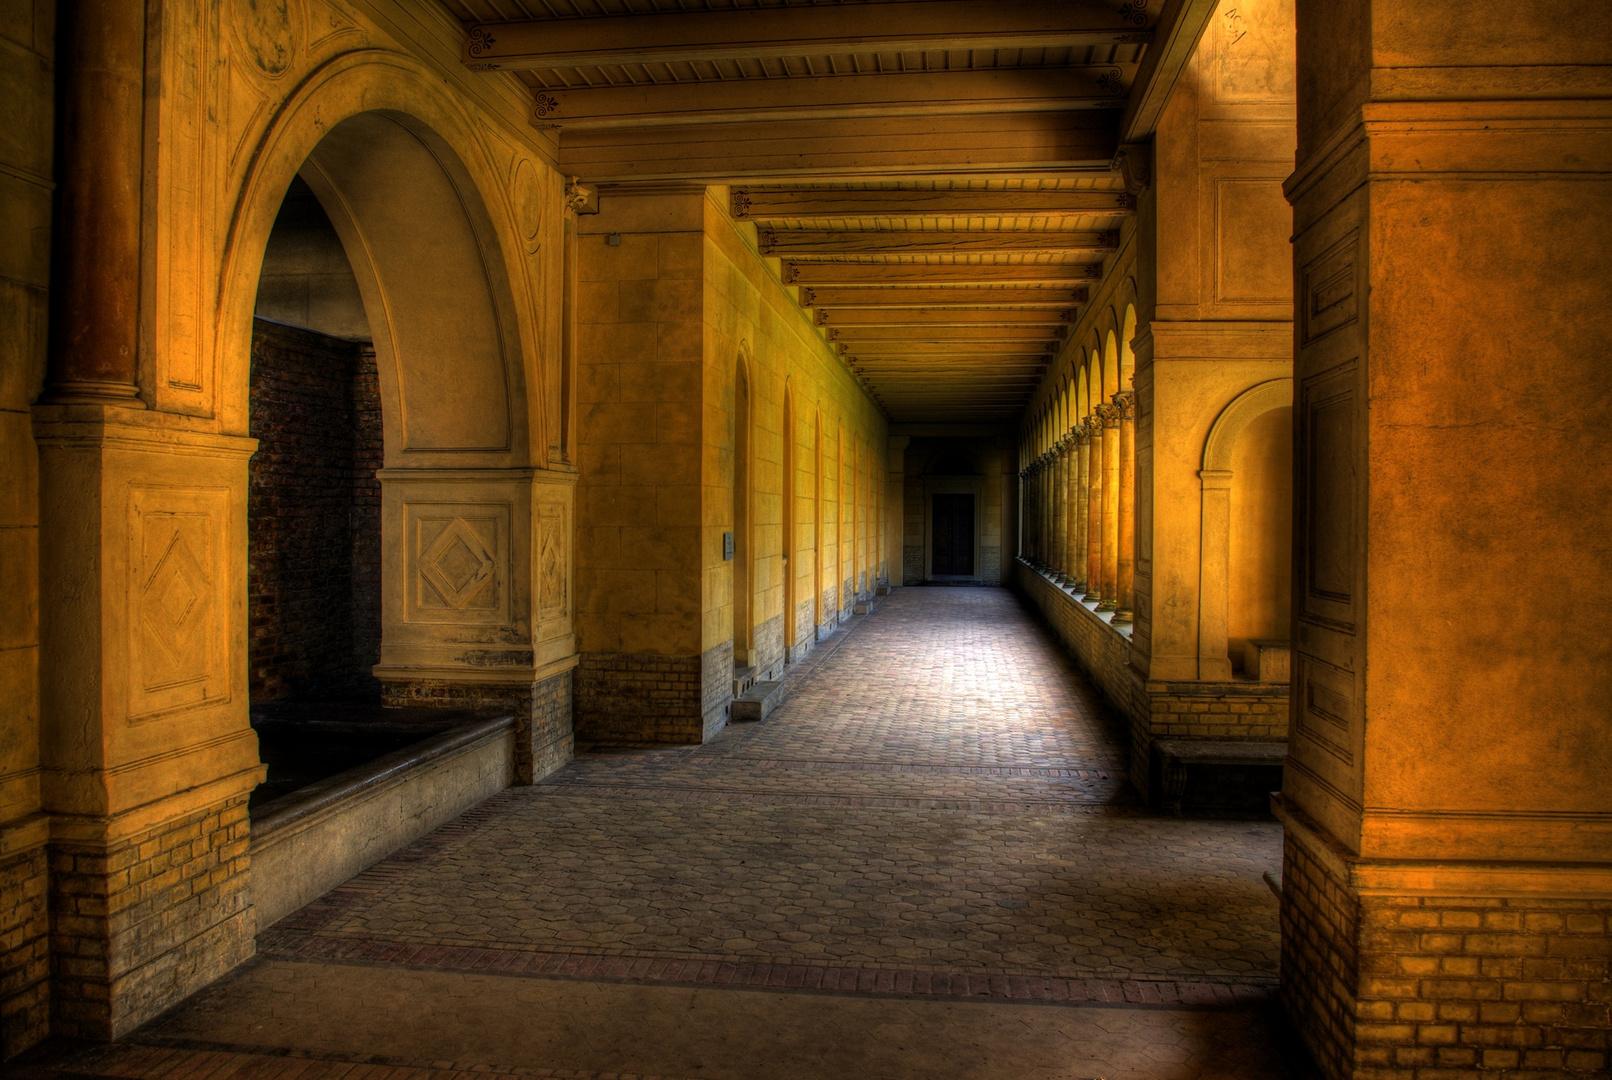 Friedenskirche im Schlosspark Sanssouci- HDR